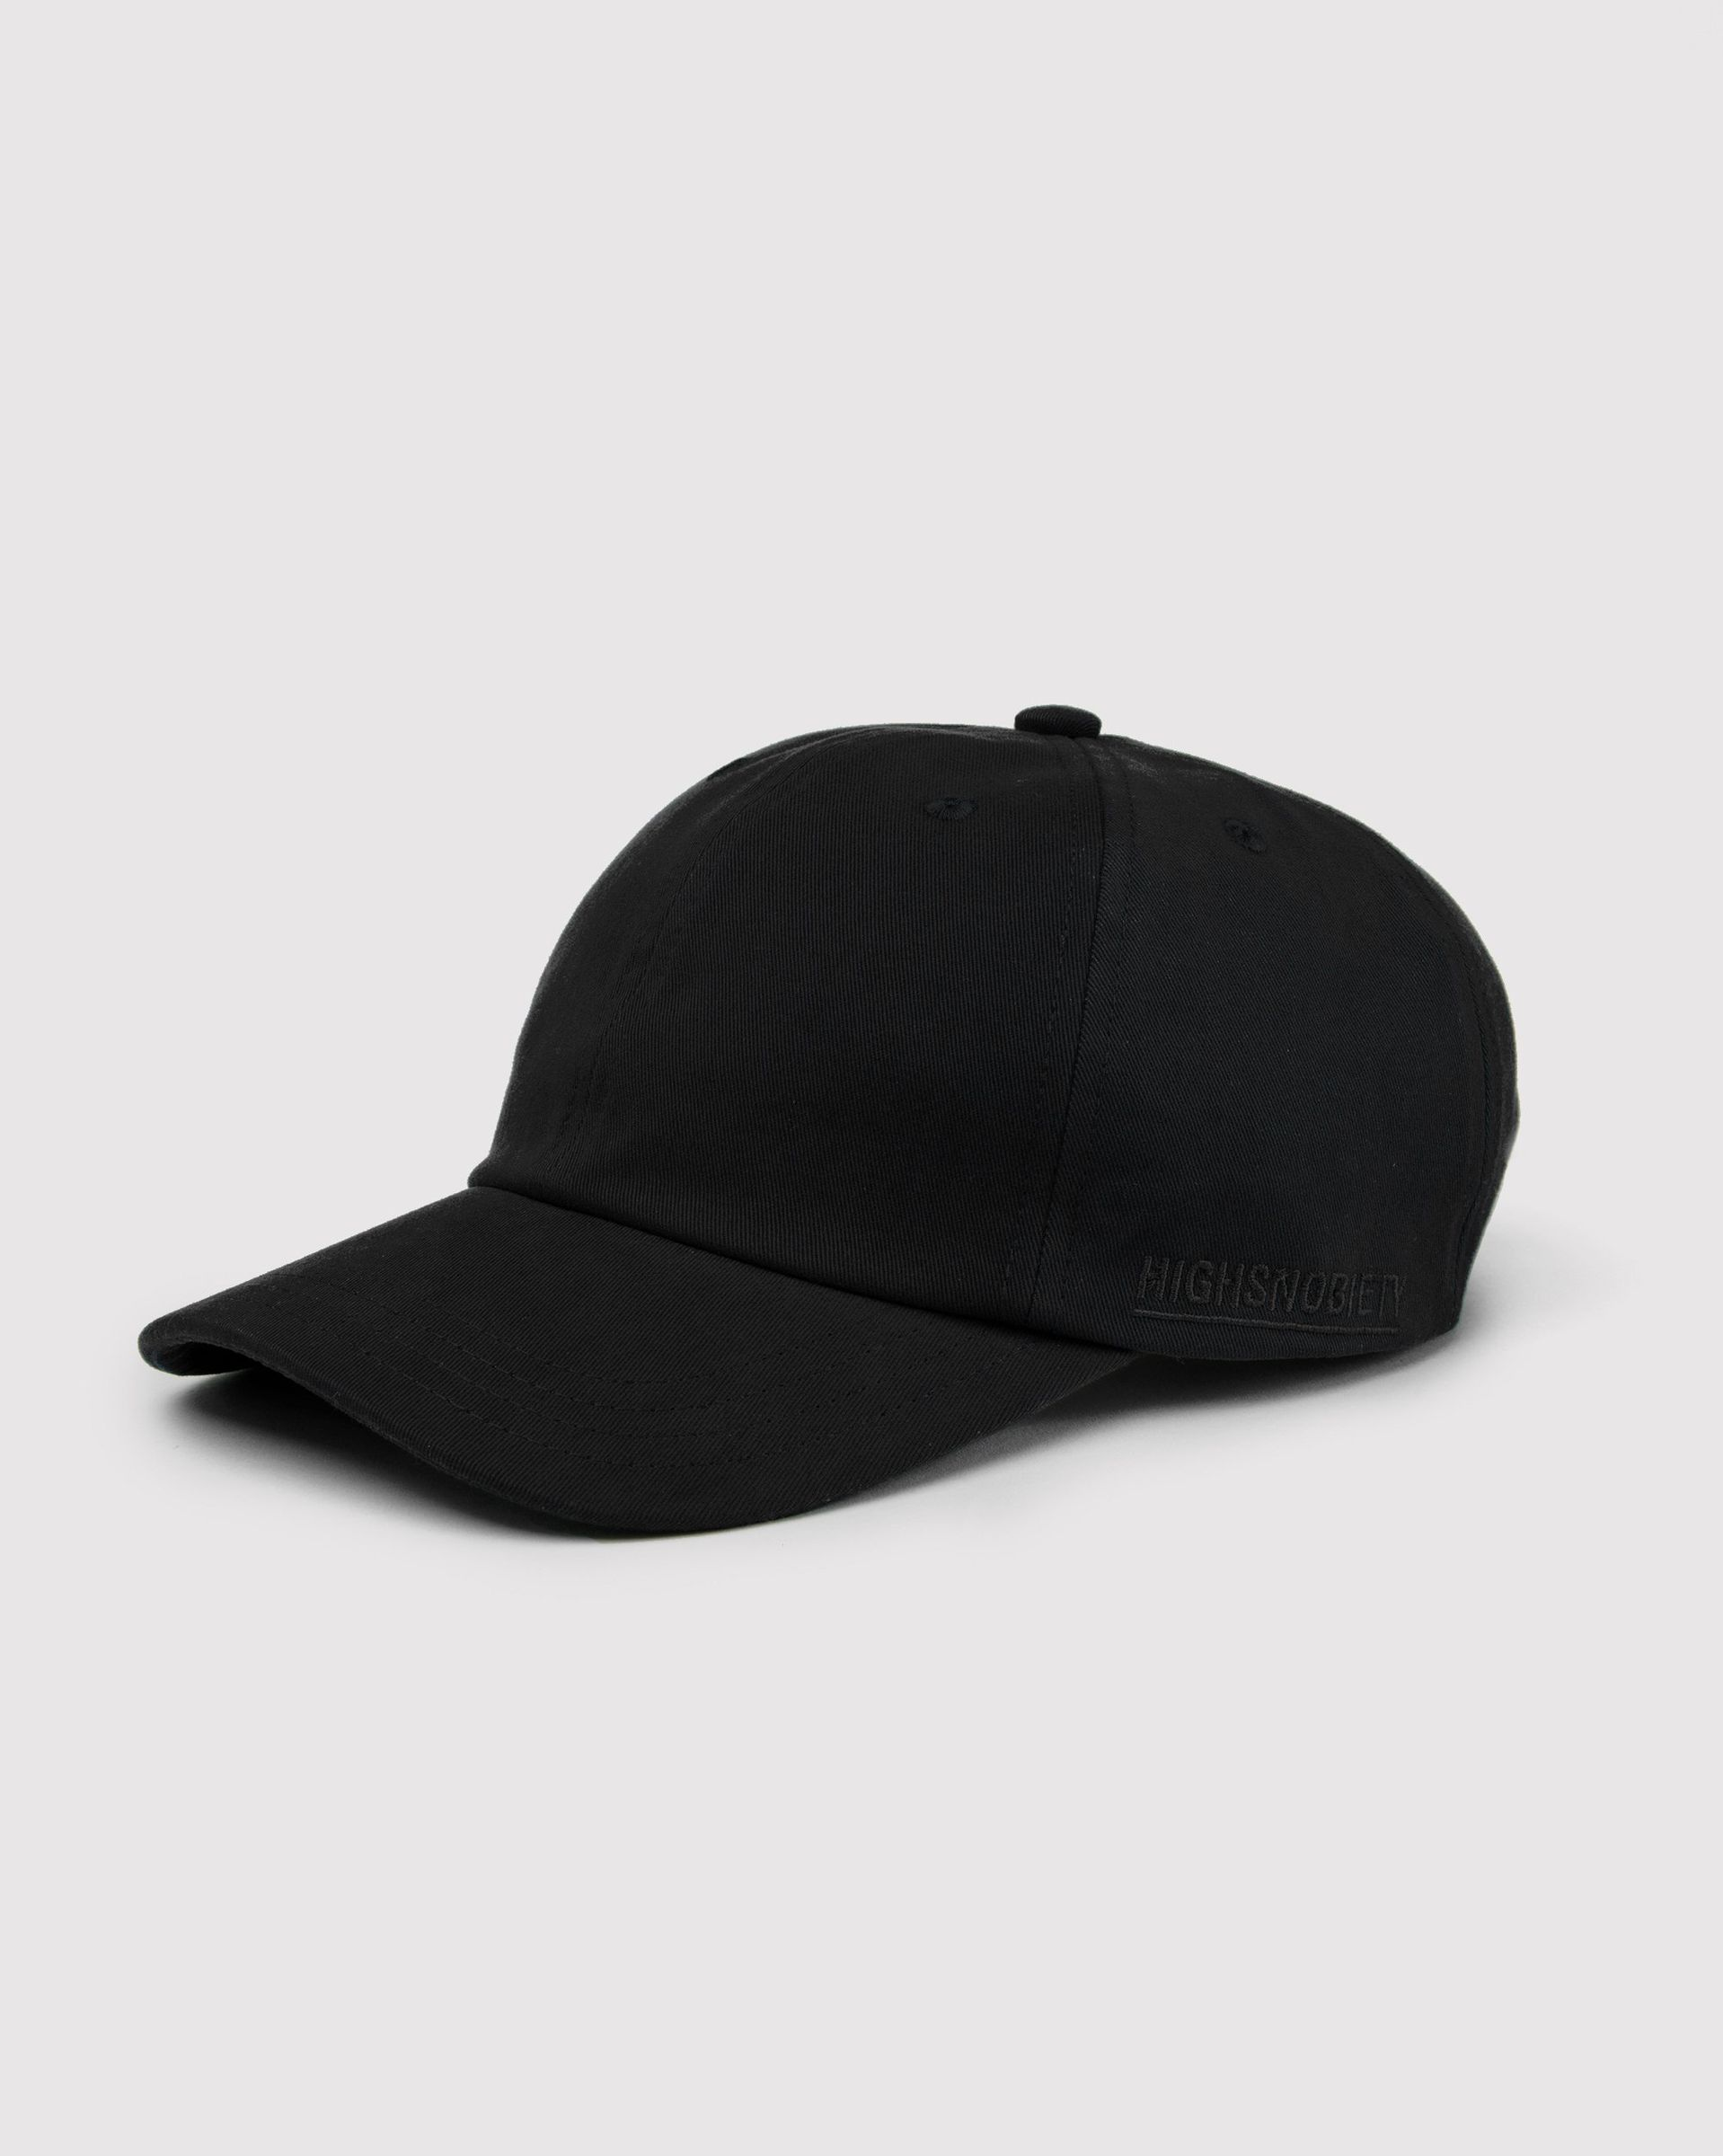 Highsnobiety Staples - Cap Black - Image 1